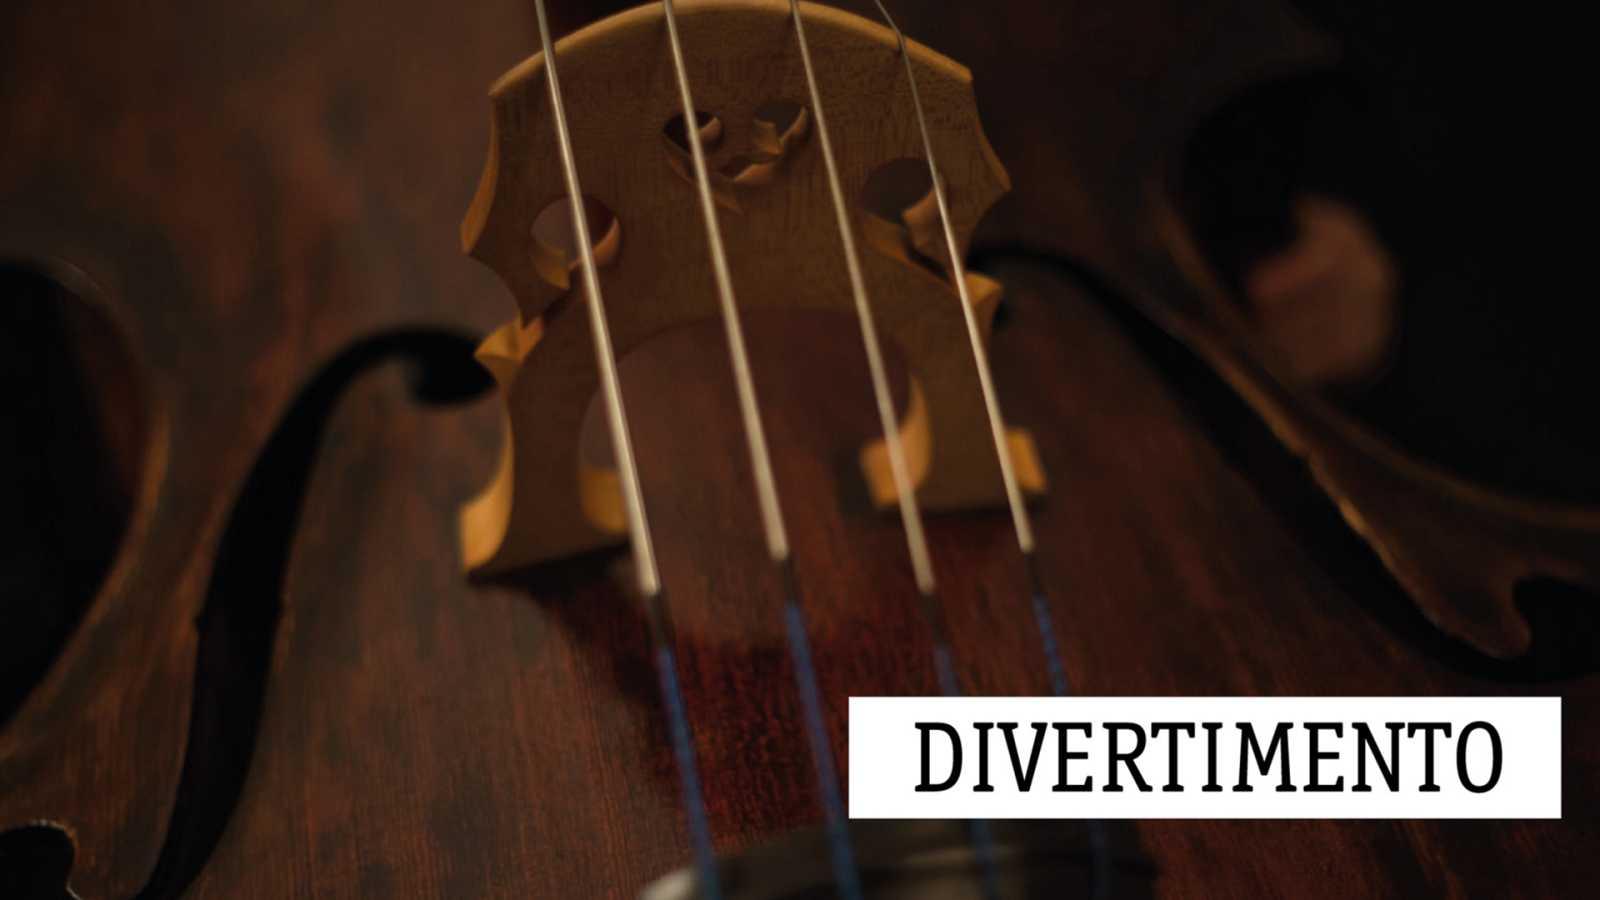 Divertimento - Navidad (I) - 24/12/20 - escuchar ahora